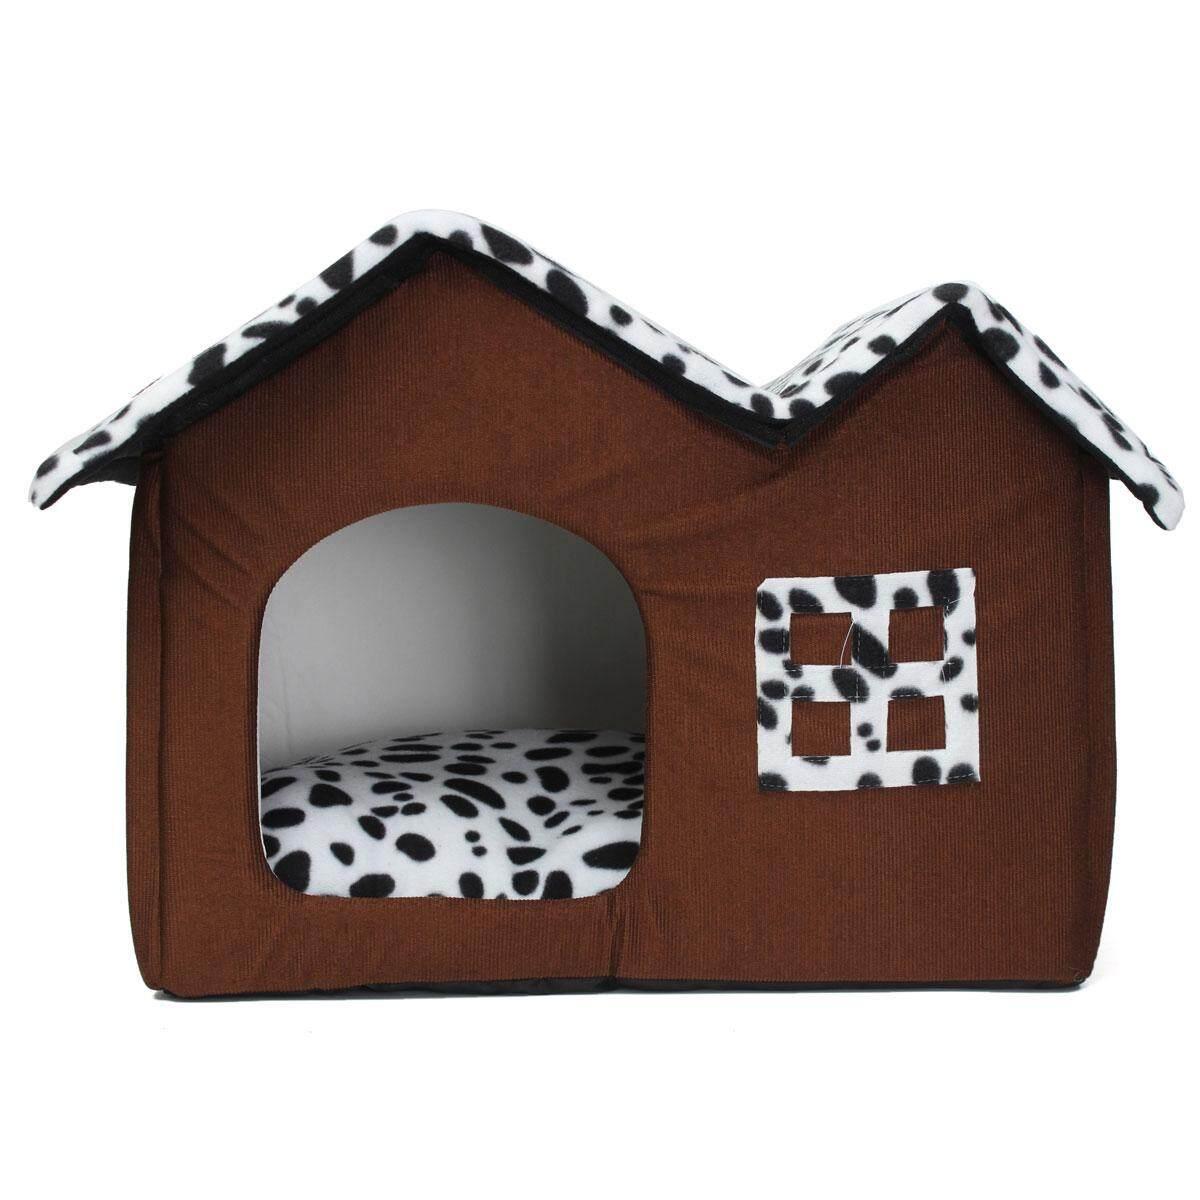 Portable Dark Brown Luxury Pet Dog Cat Bed House Warm Mat Snug Puppy Bedding By Surmounter.